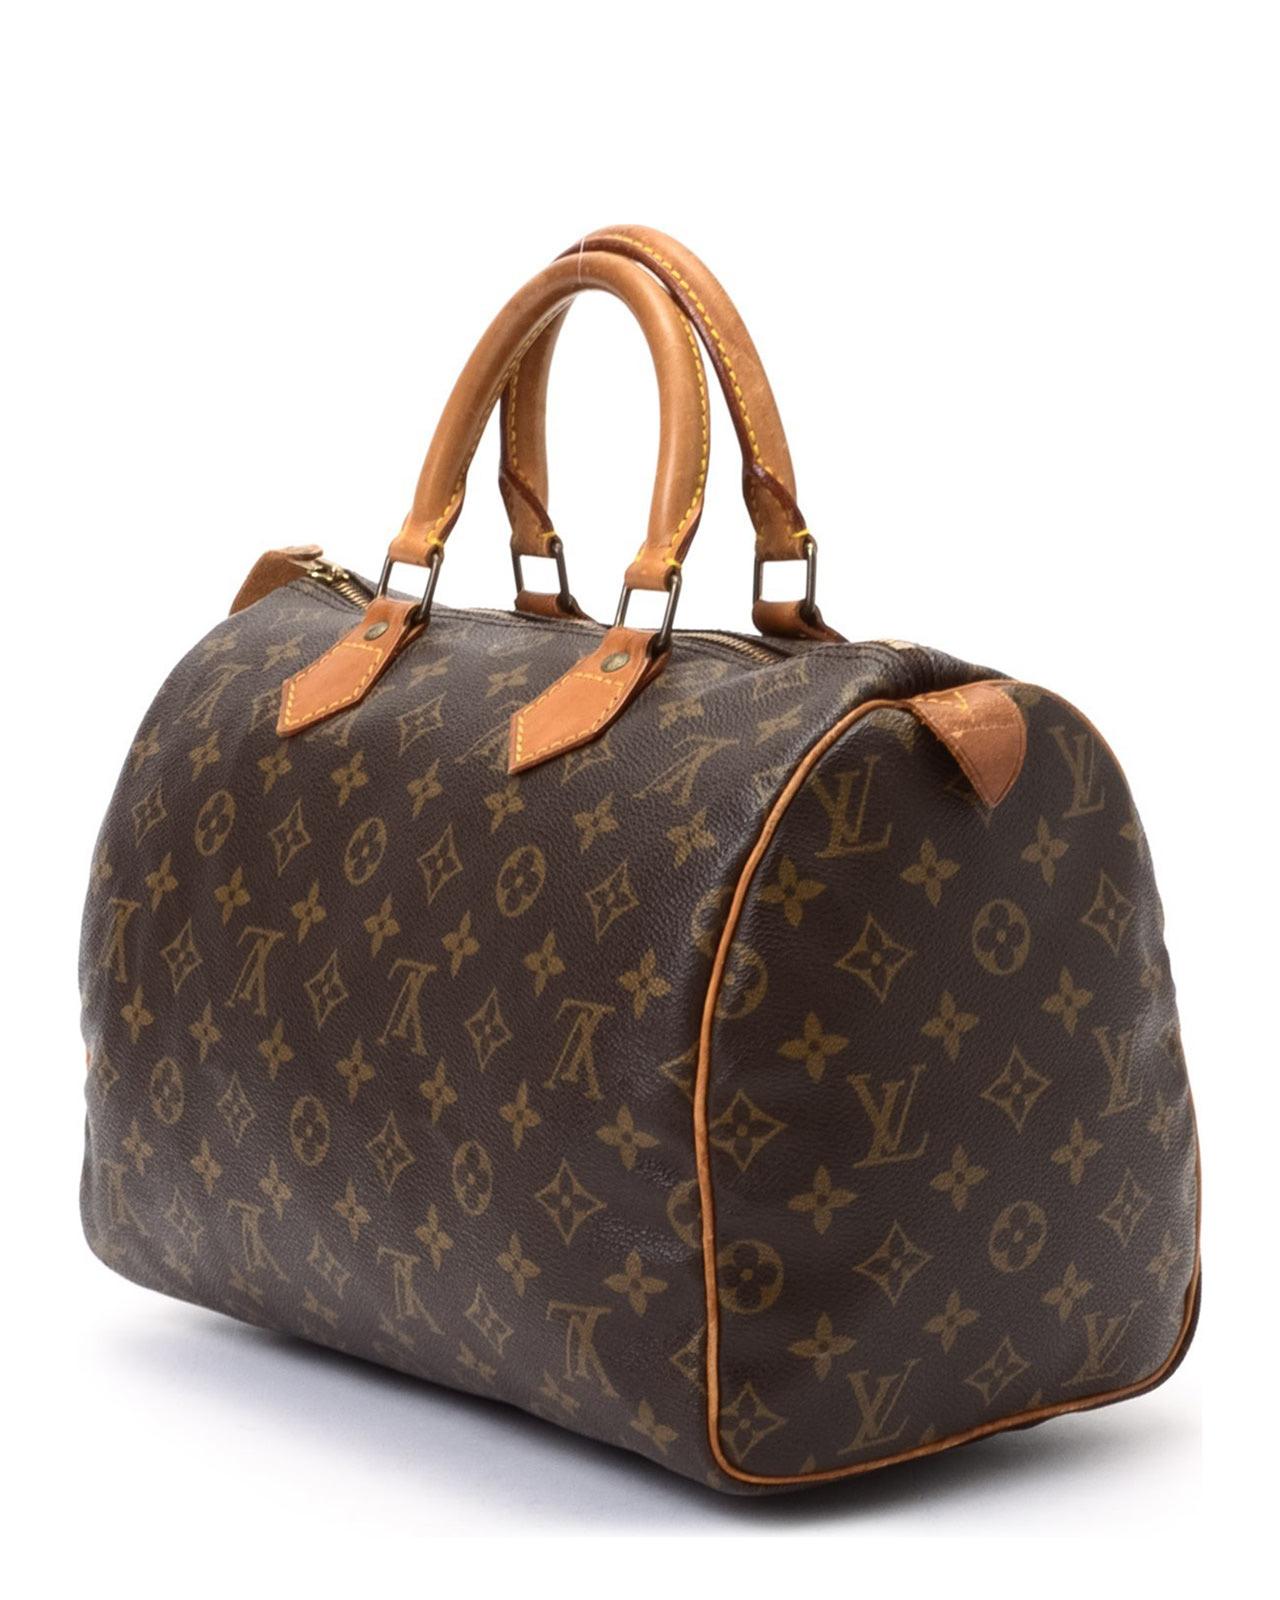 Property Brothers Apply Louis Vuitton Speedy 30 Handbag In Brown Lyst